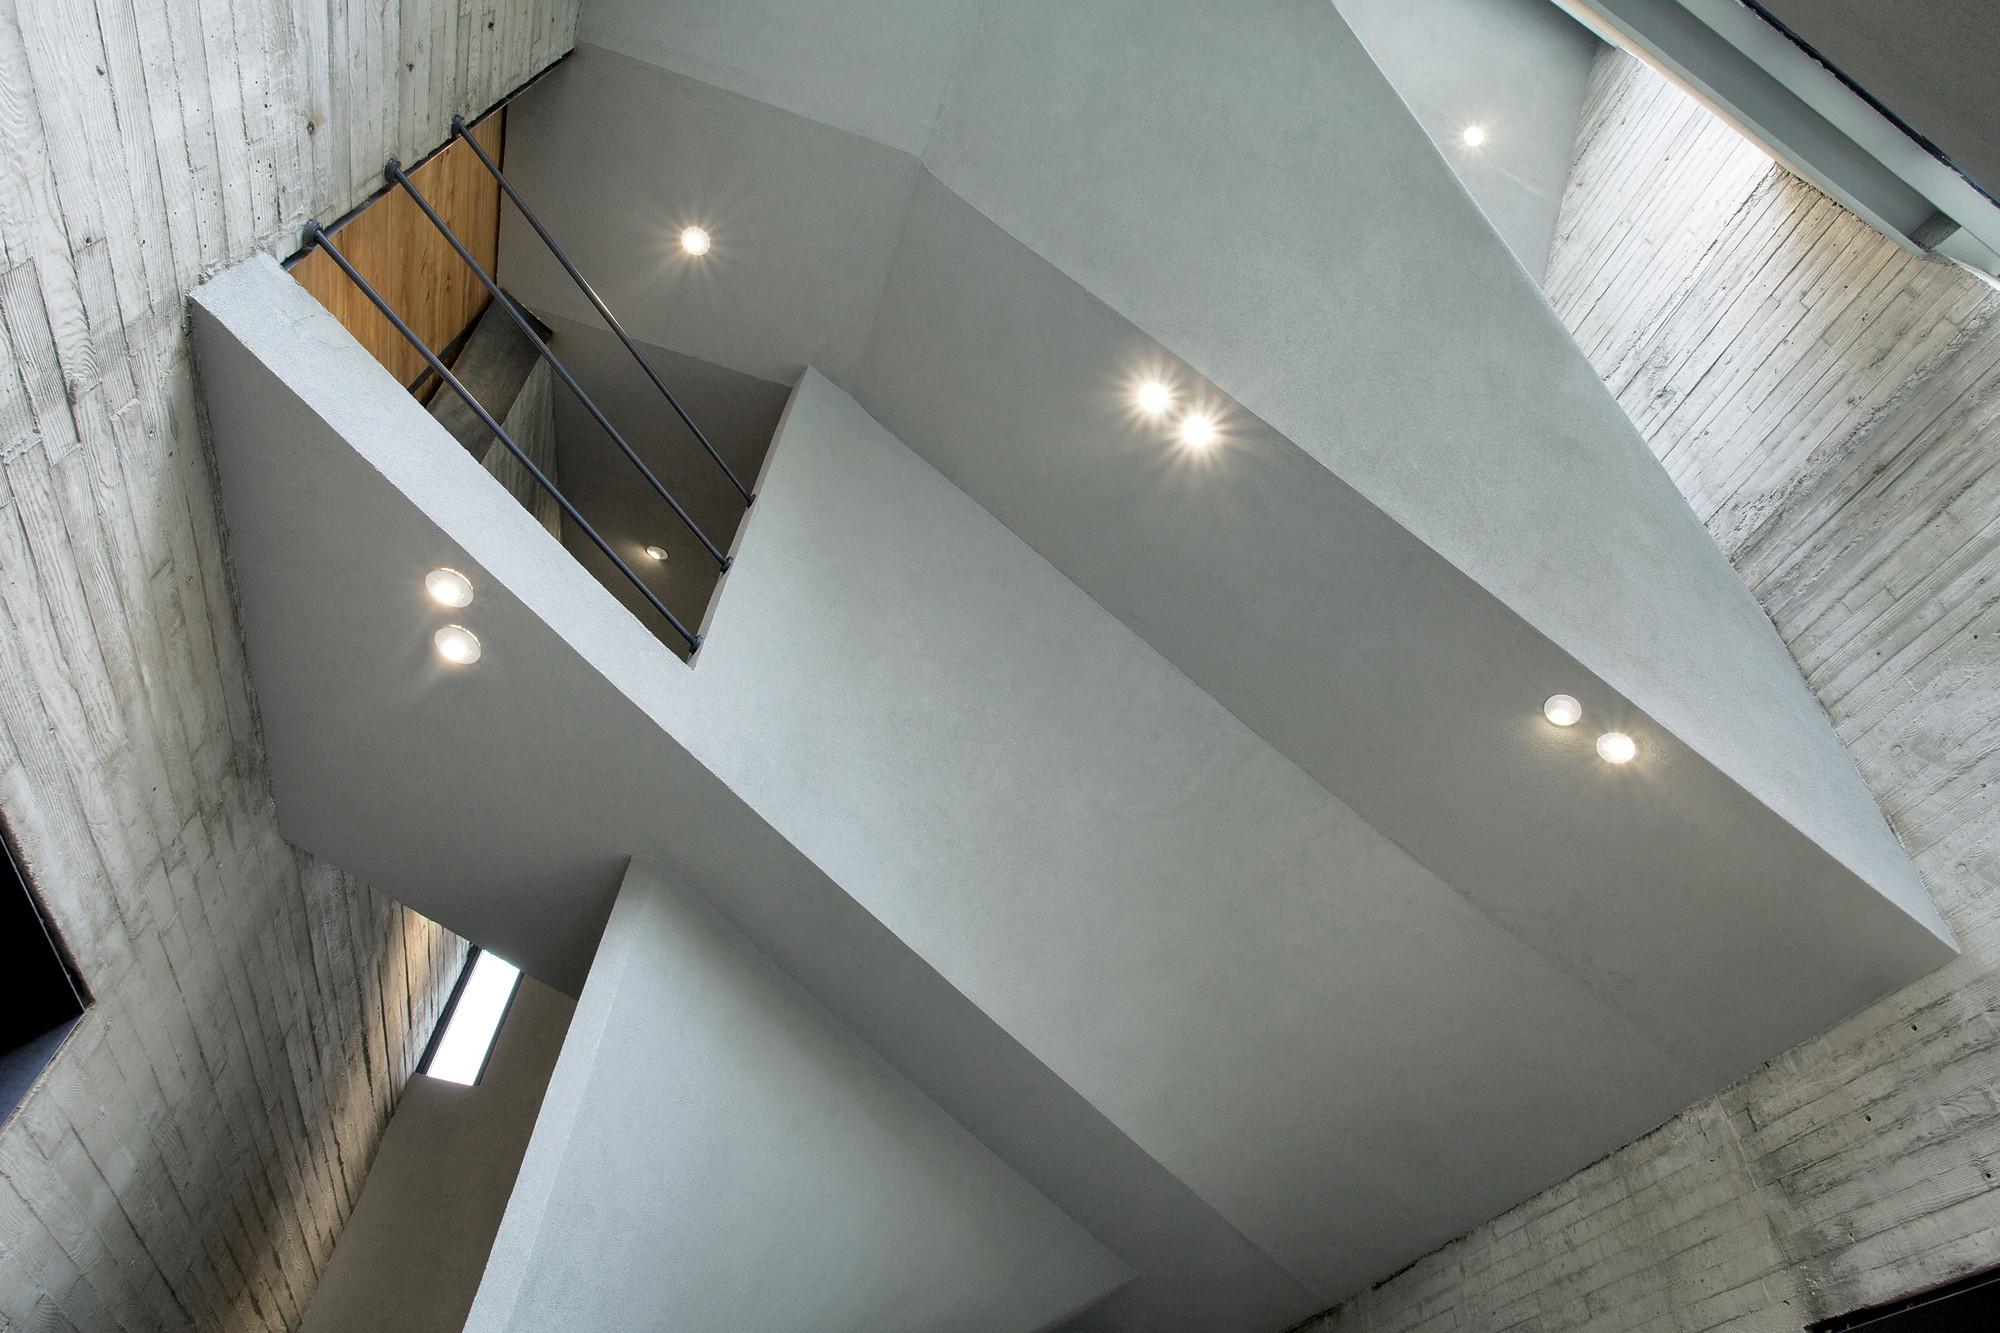 Jade Museum / Archi-Union Architects